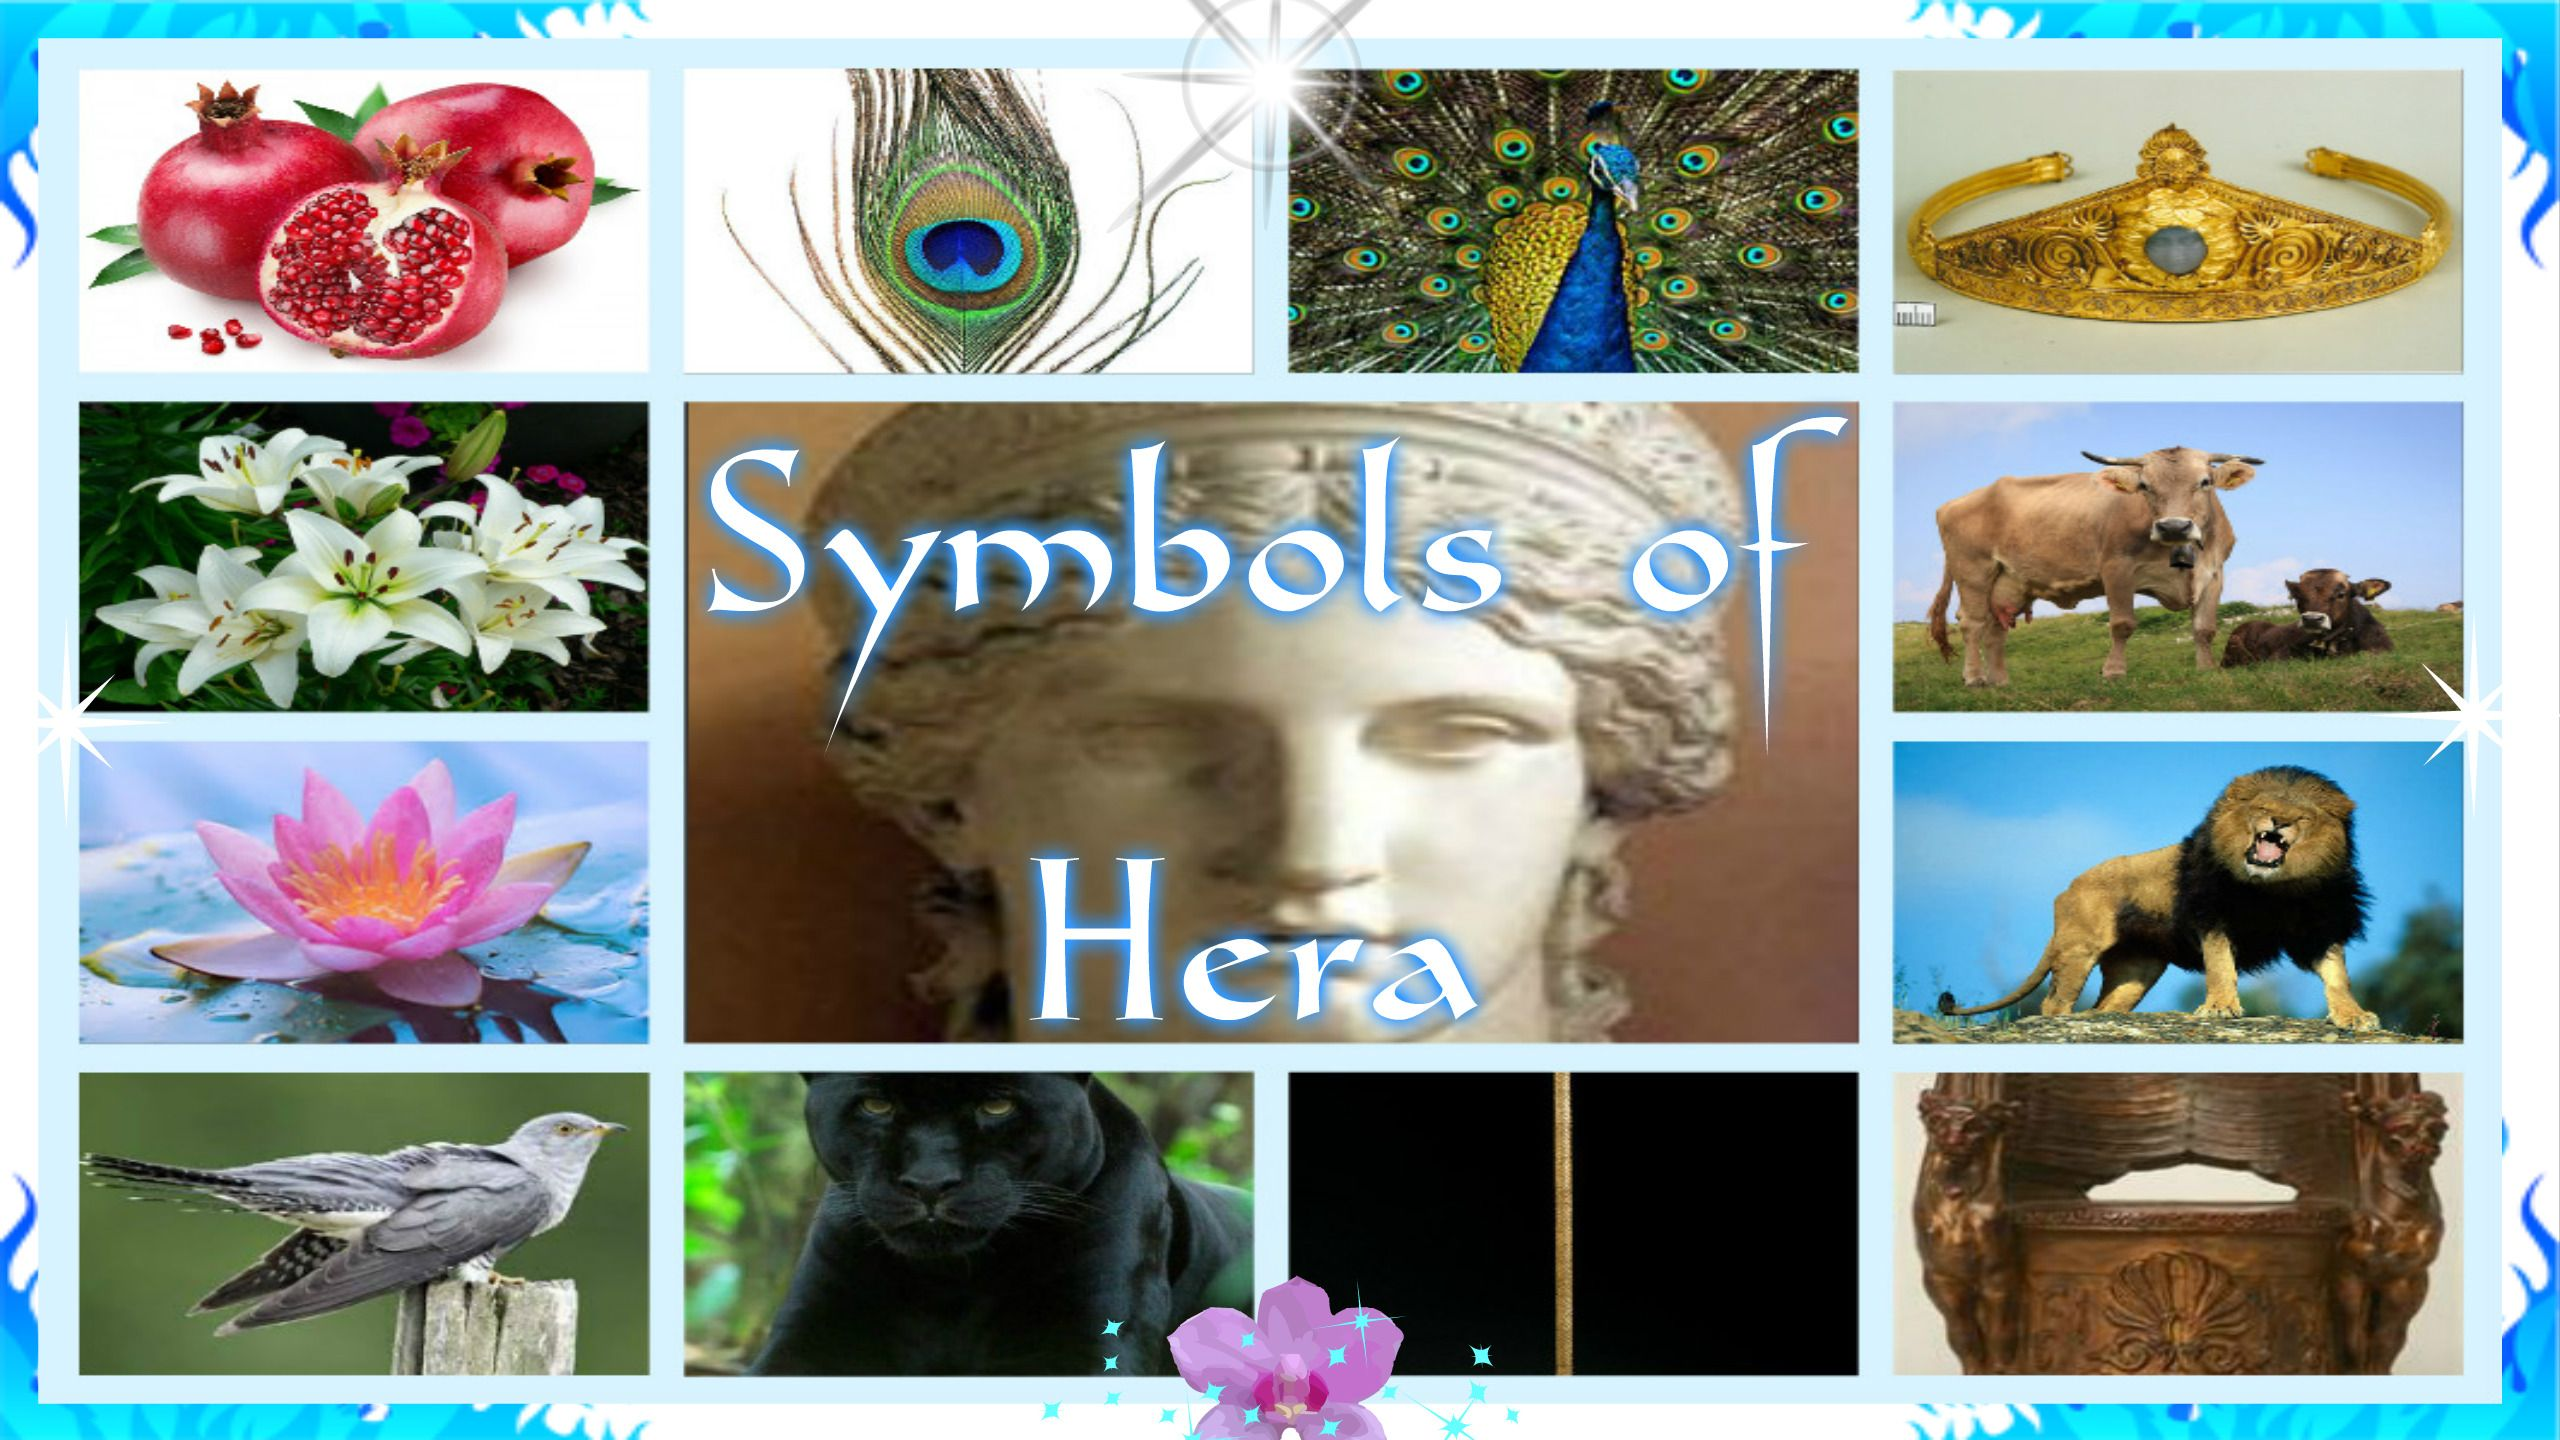 Symbols Or Hera Pomegranate Peacock Peacock Feather